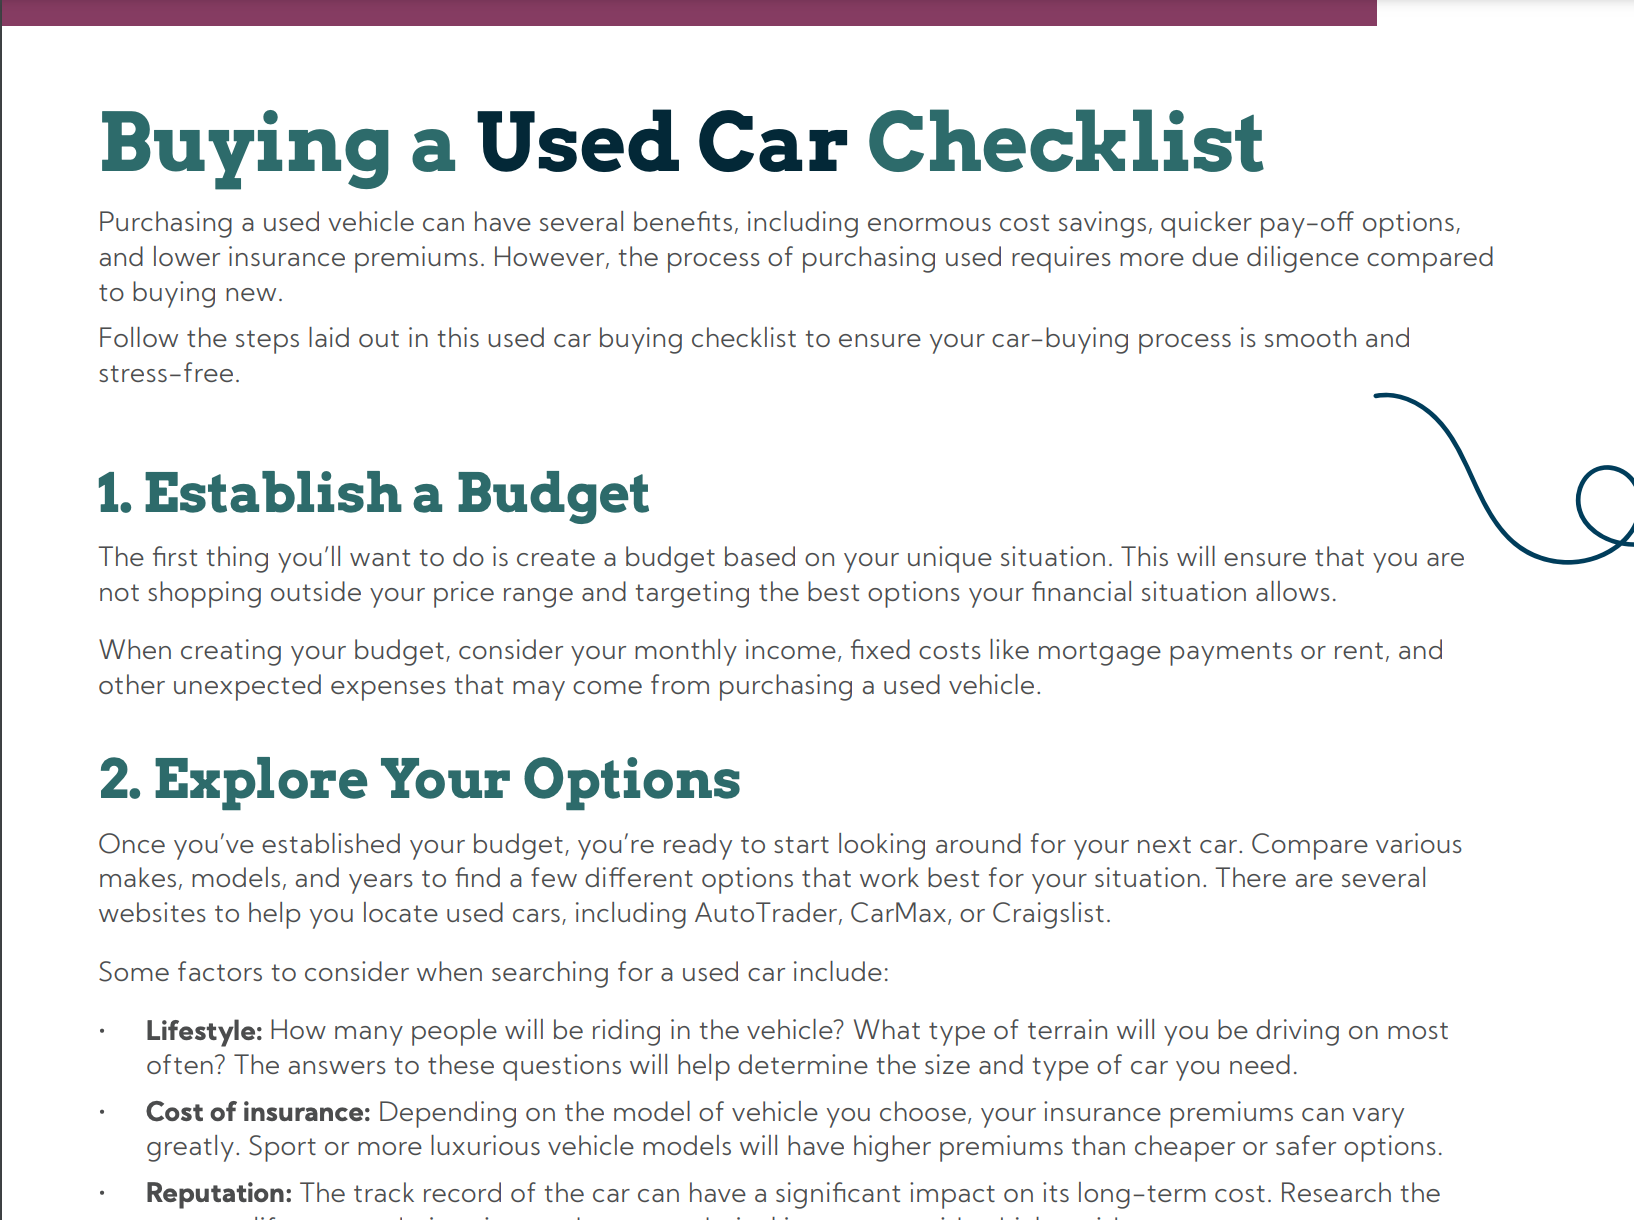 used-car-checklist-thumbnail